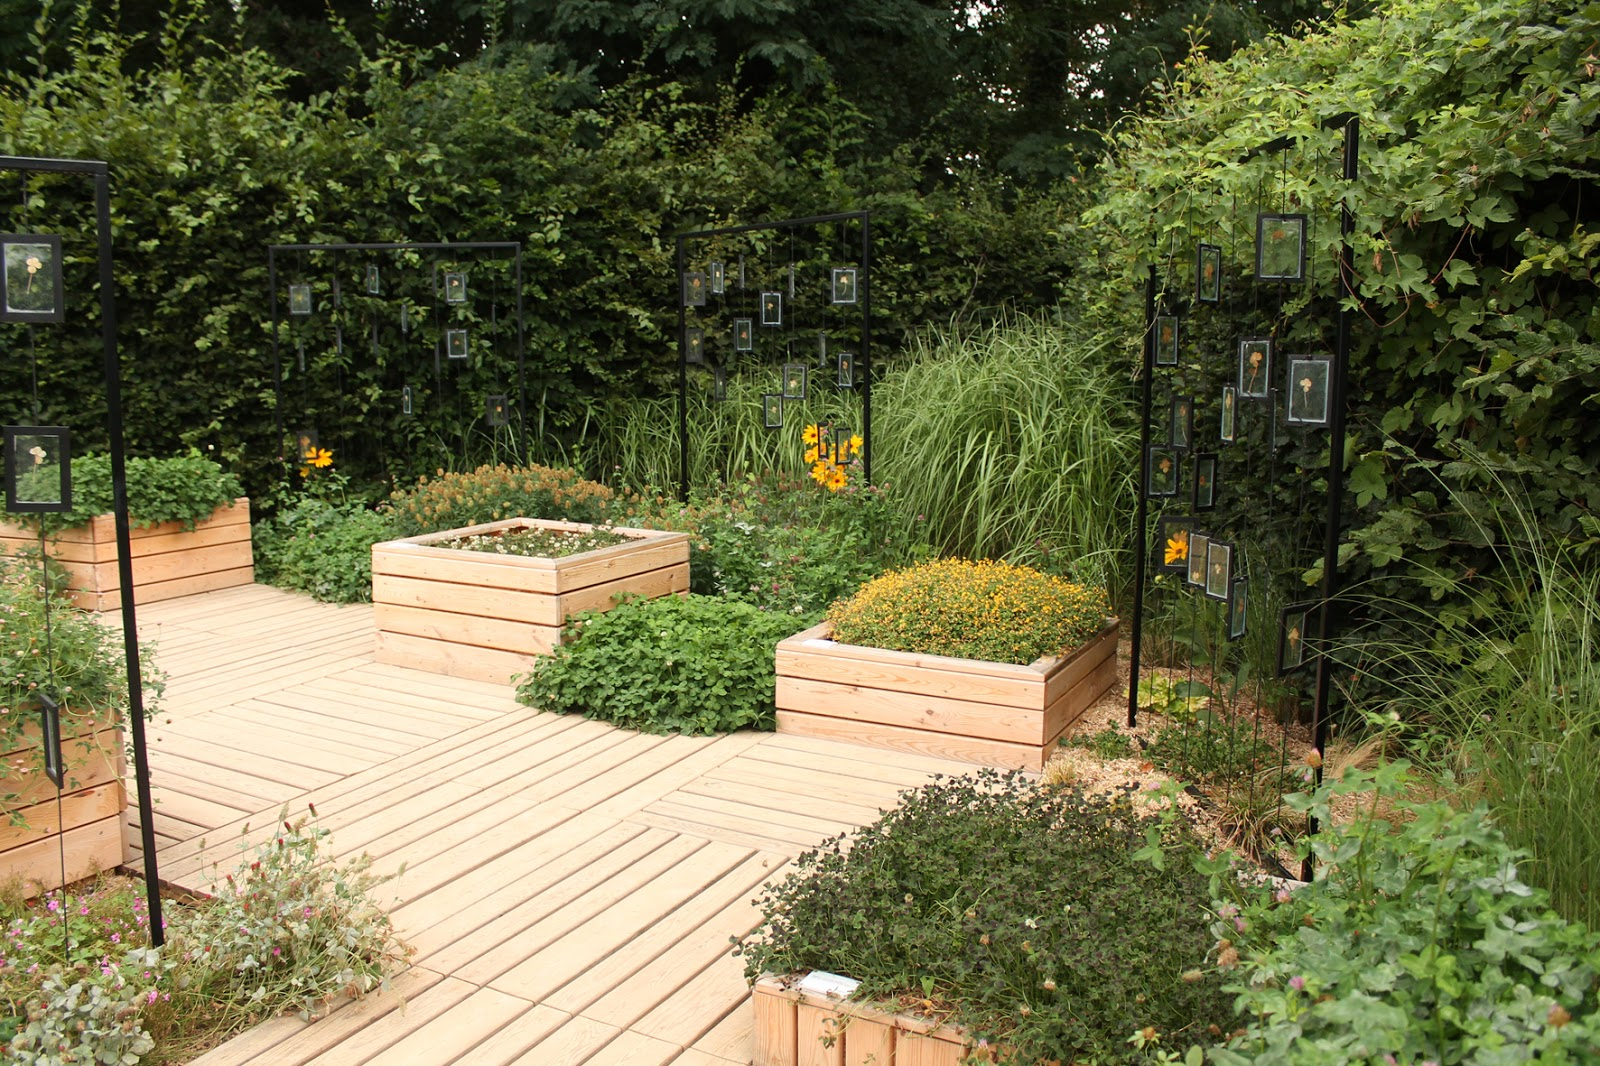 Tricyrtis et jardins toad lilies and gardens chaumont for Jardin bonheur 2015